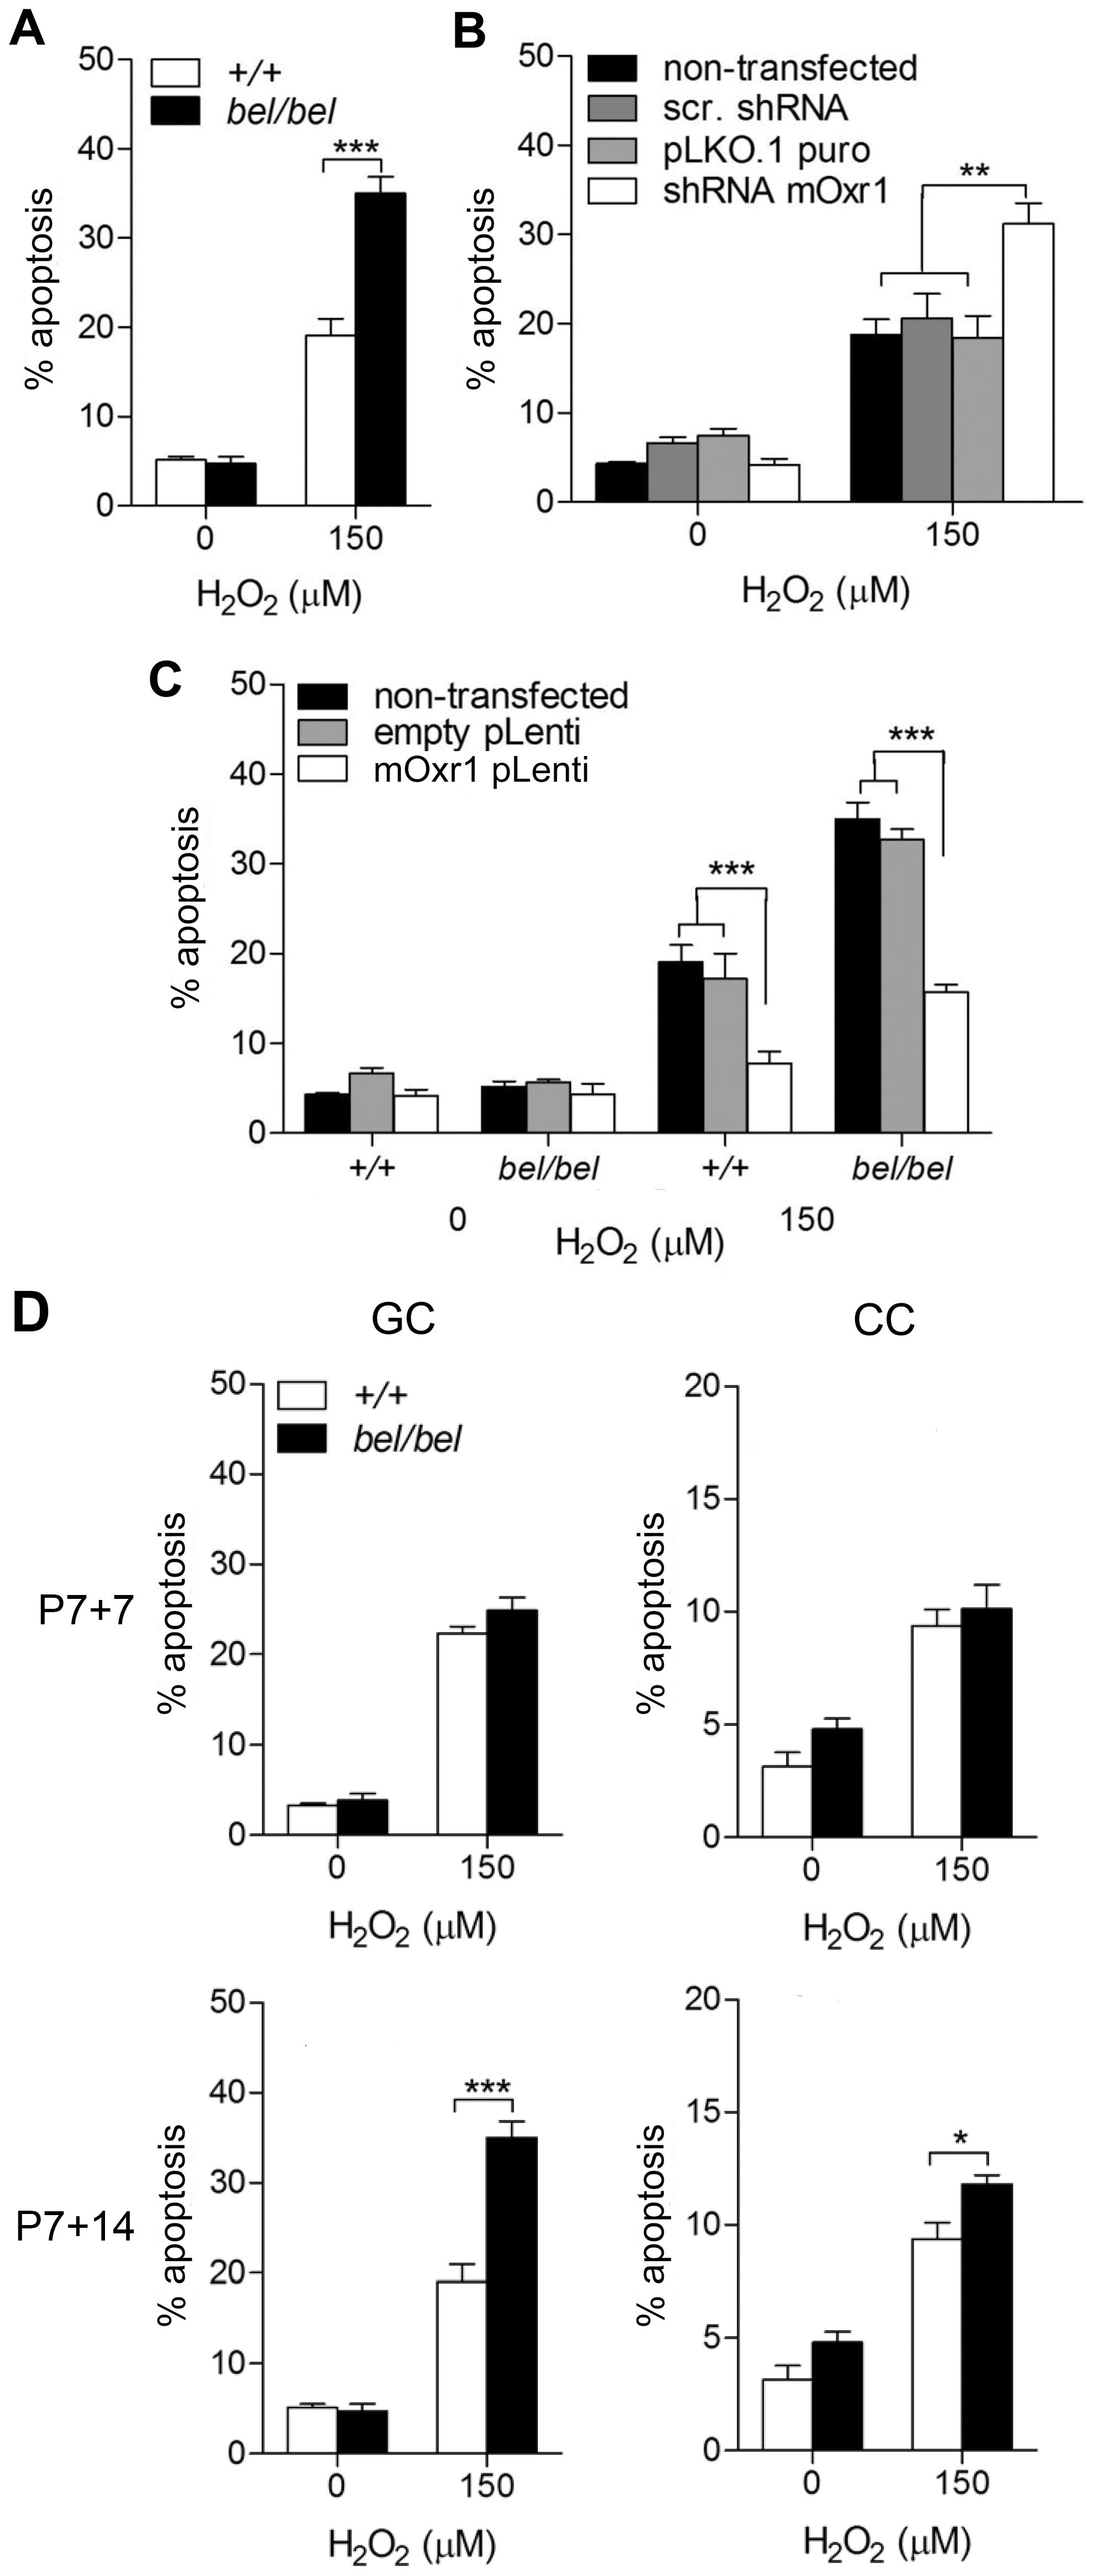 Oxr1 regulates sensitivity of GC neurons to oxidative stress.